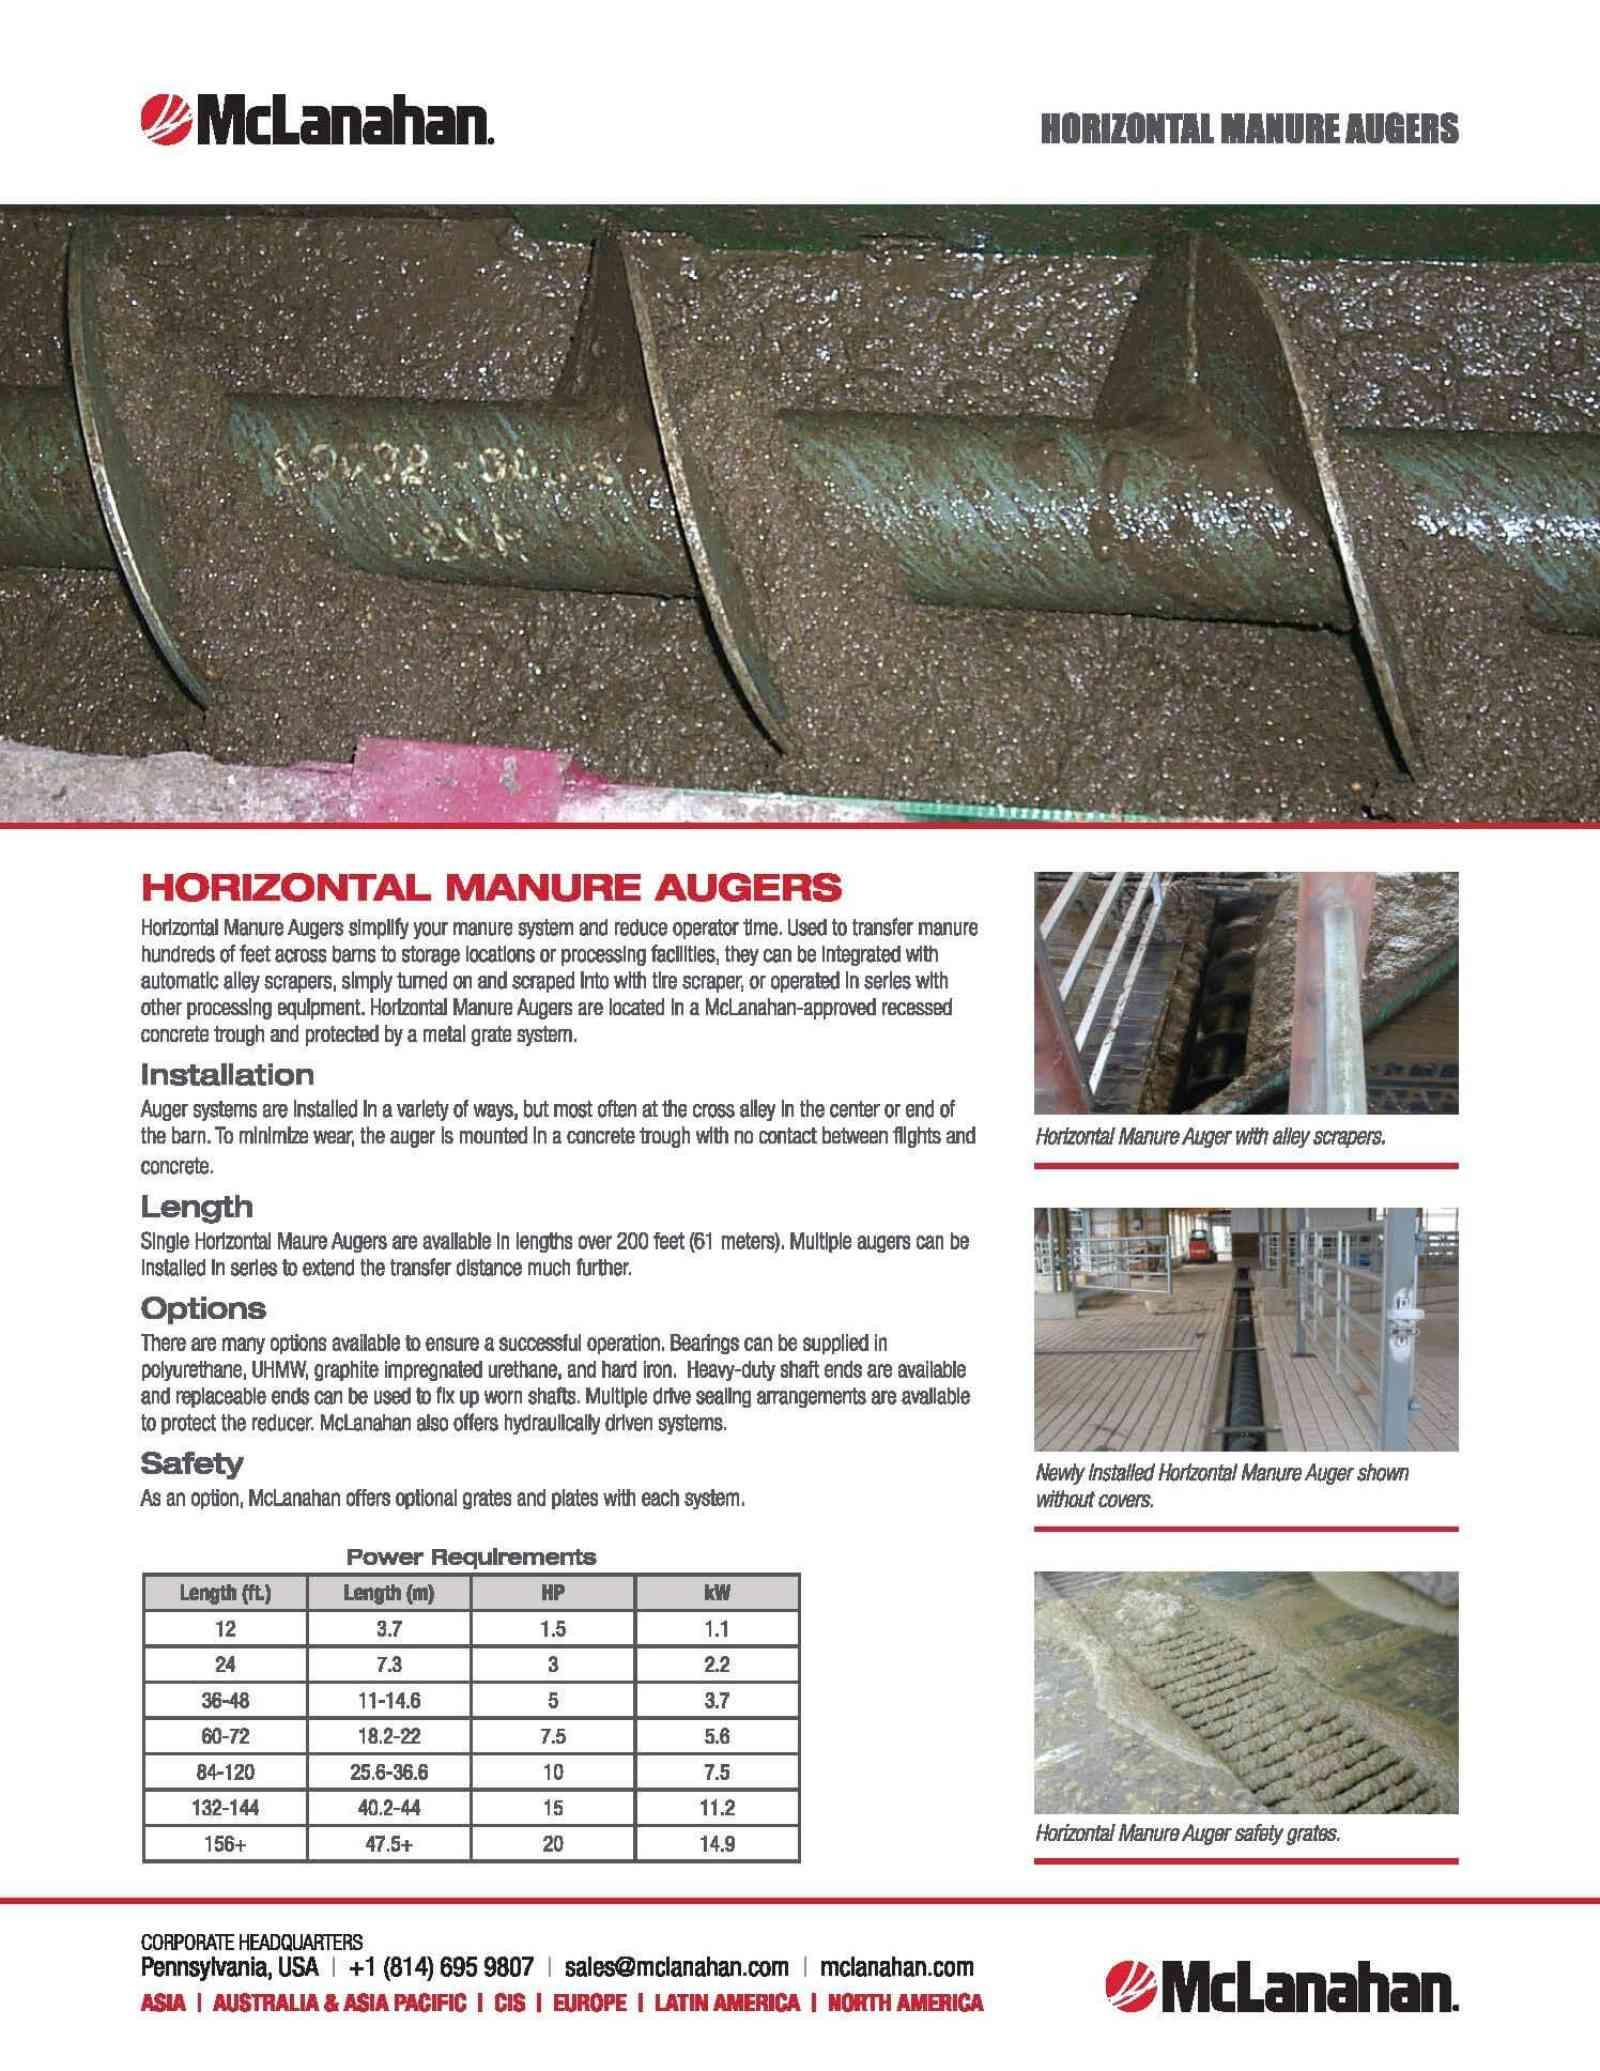 Horizontal Manure Auger Brochure Image Preview